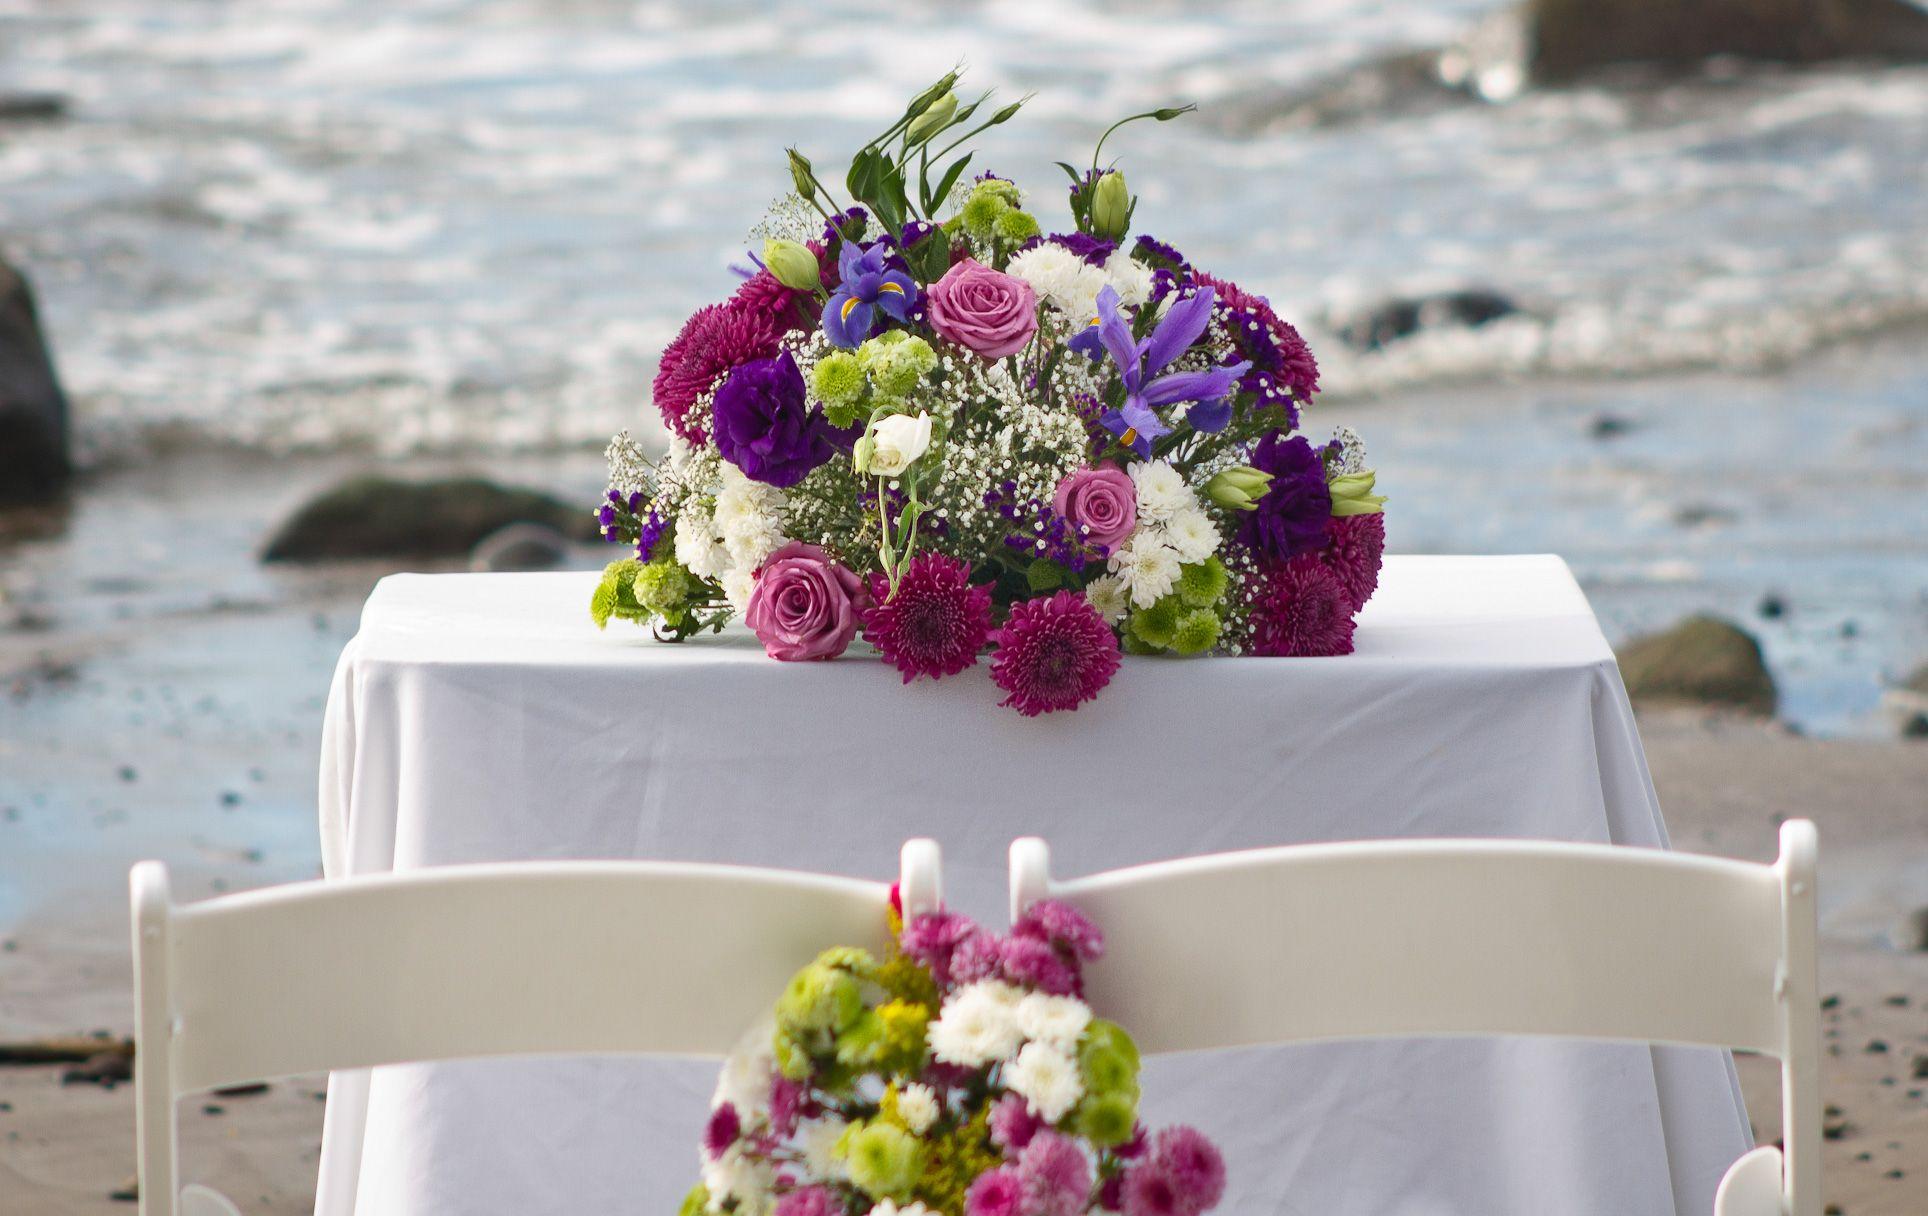 Unicos como hacer arreglos florales para bodas ideas - Arreglos de flores para bodas ...